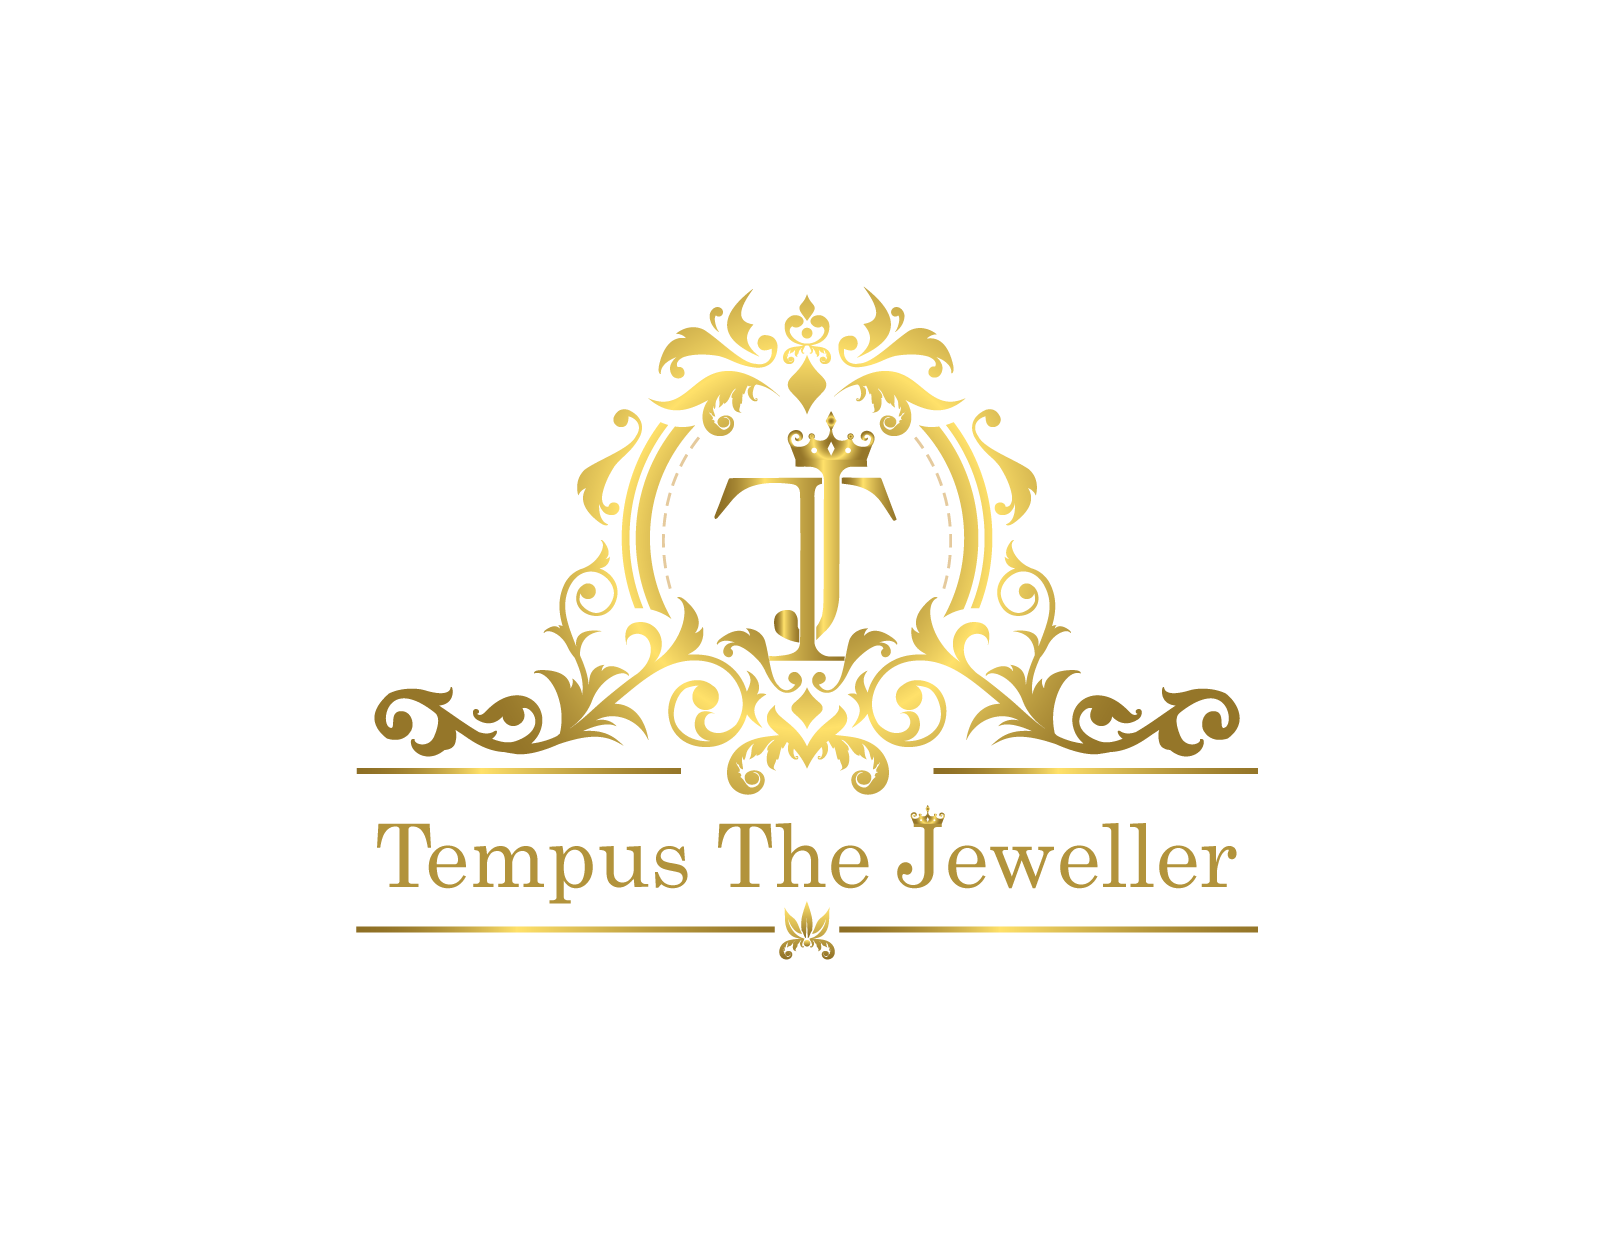 final-tempus-logo-1600x.png